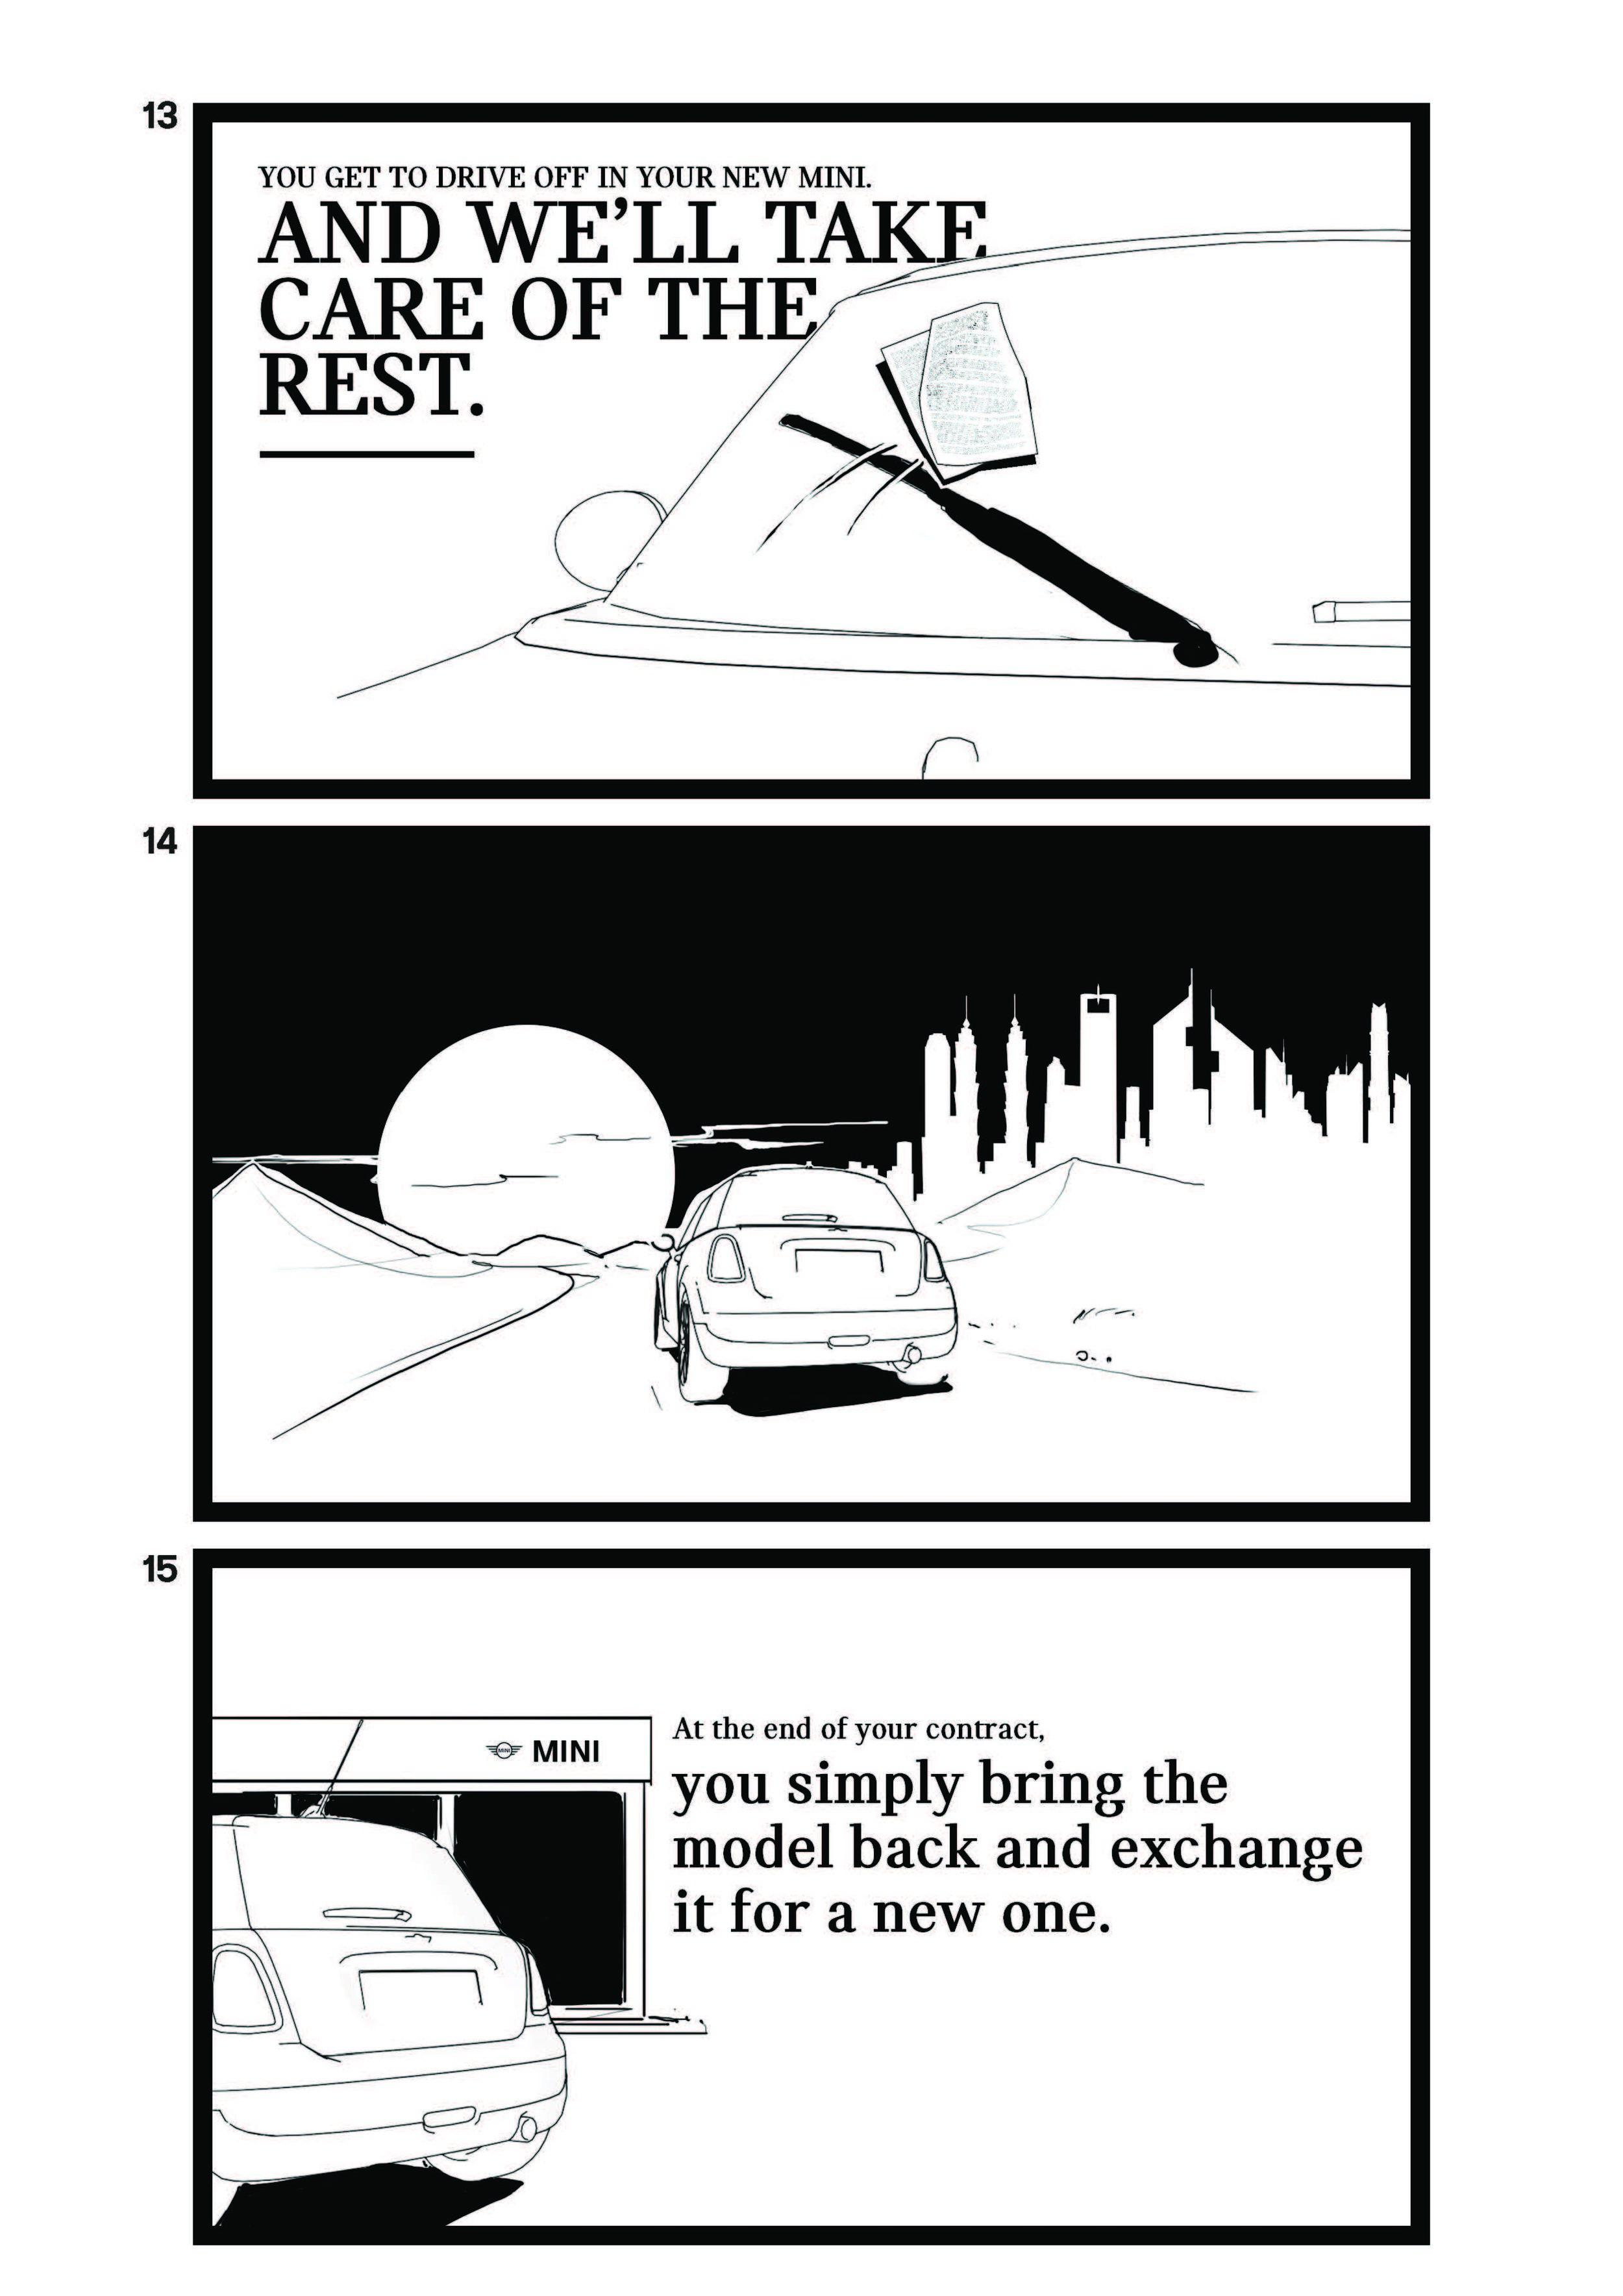 Storyboard_MINI_leasing_v4_final_Page_7.jpg